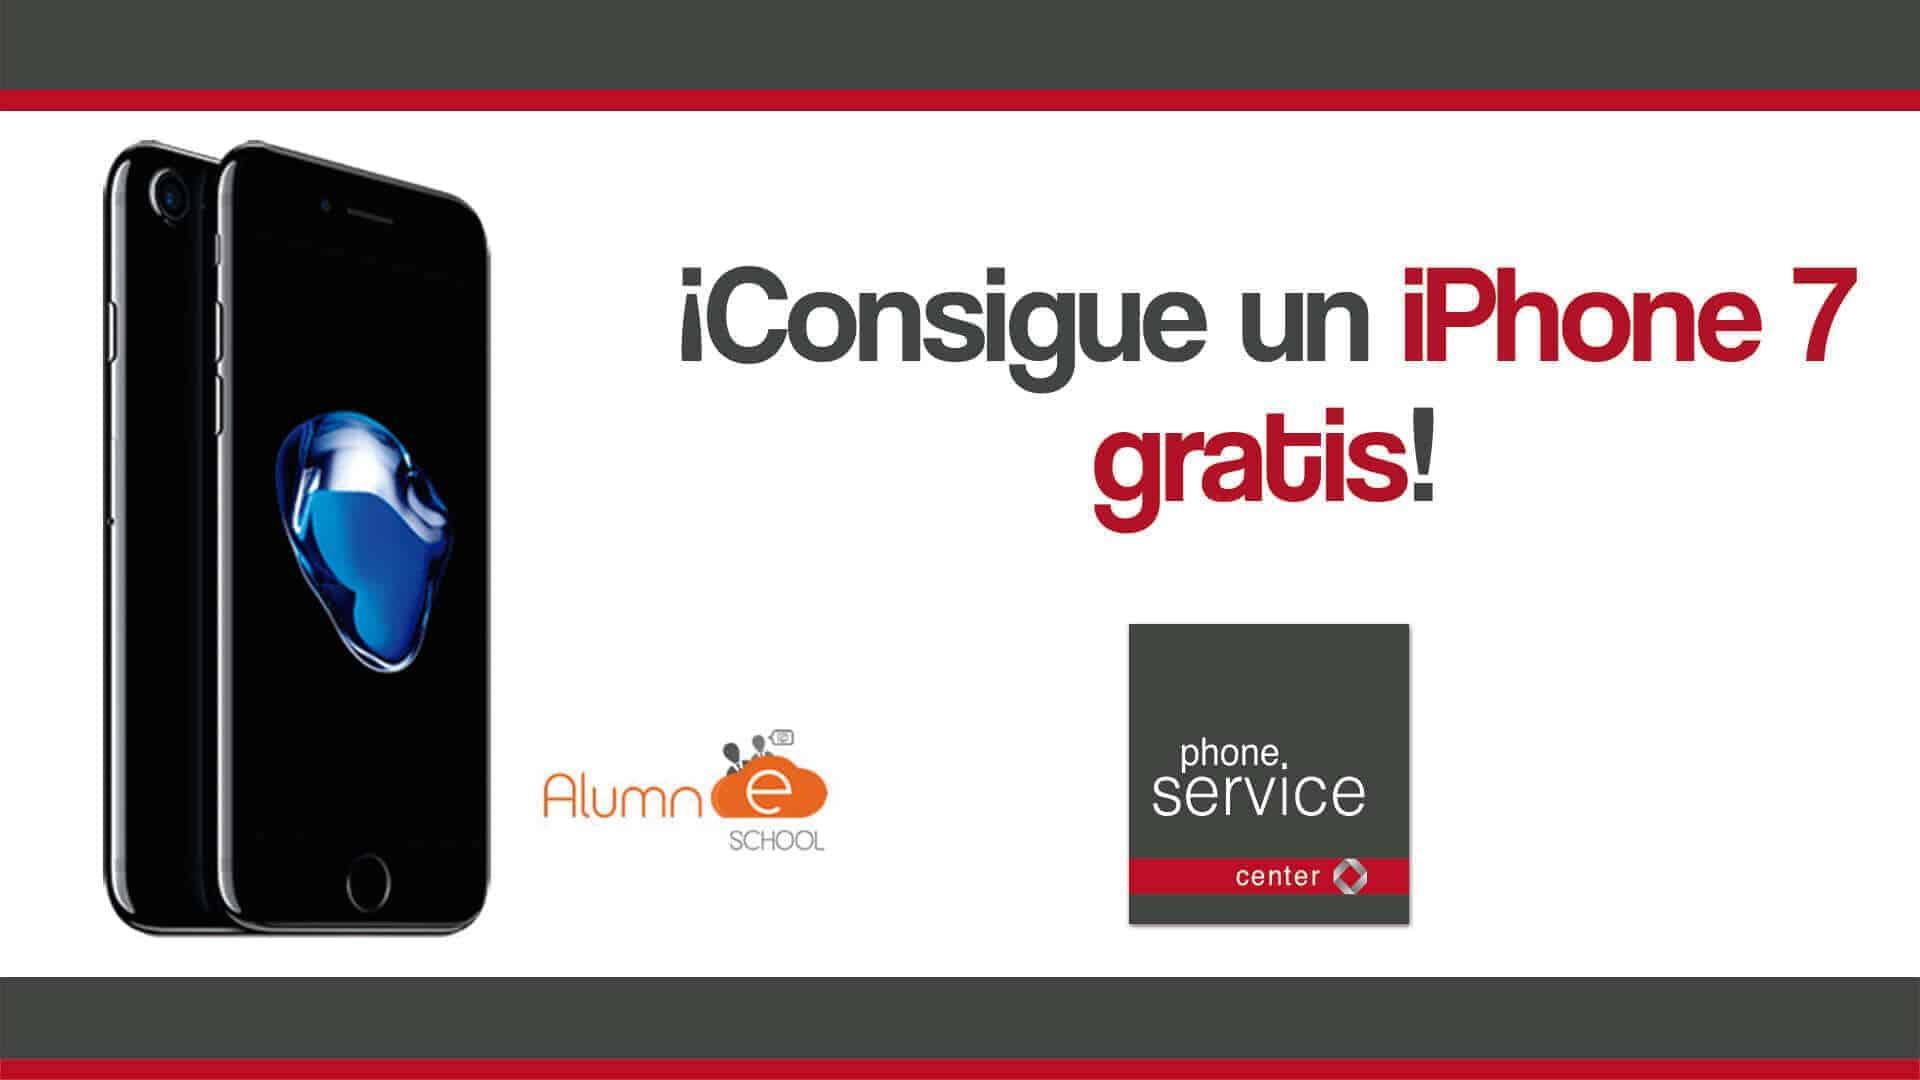 Consigue un iPhone 7 gratis